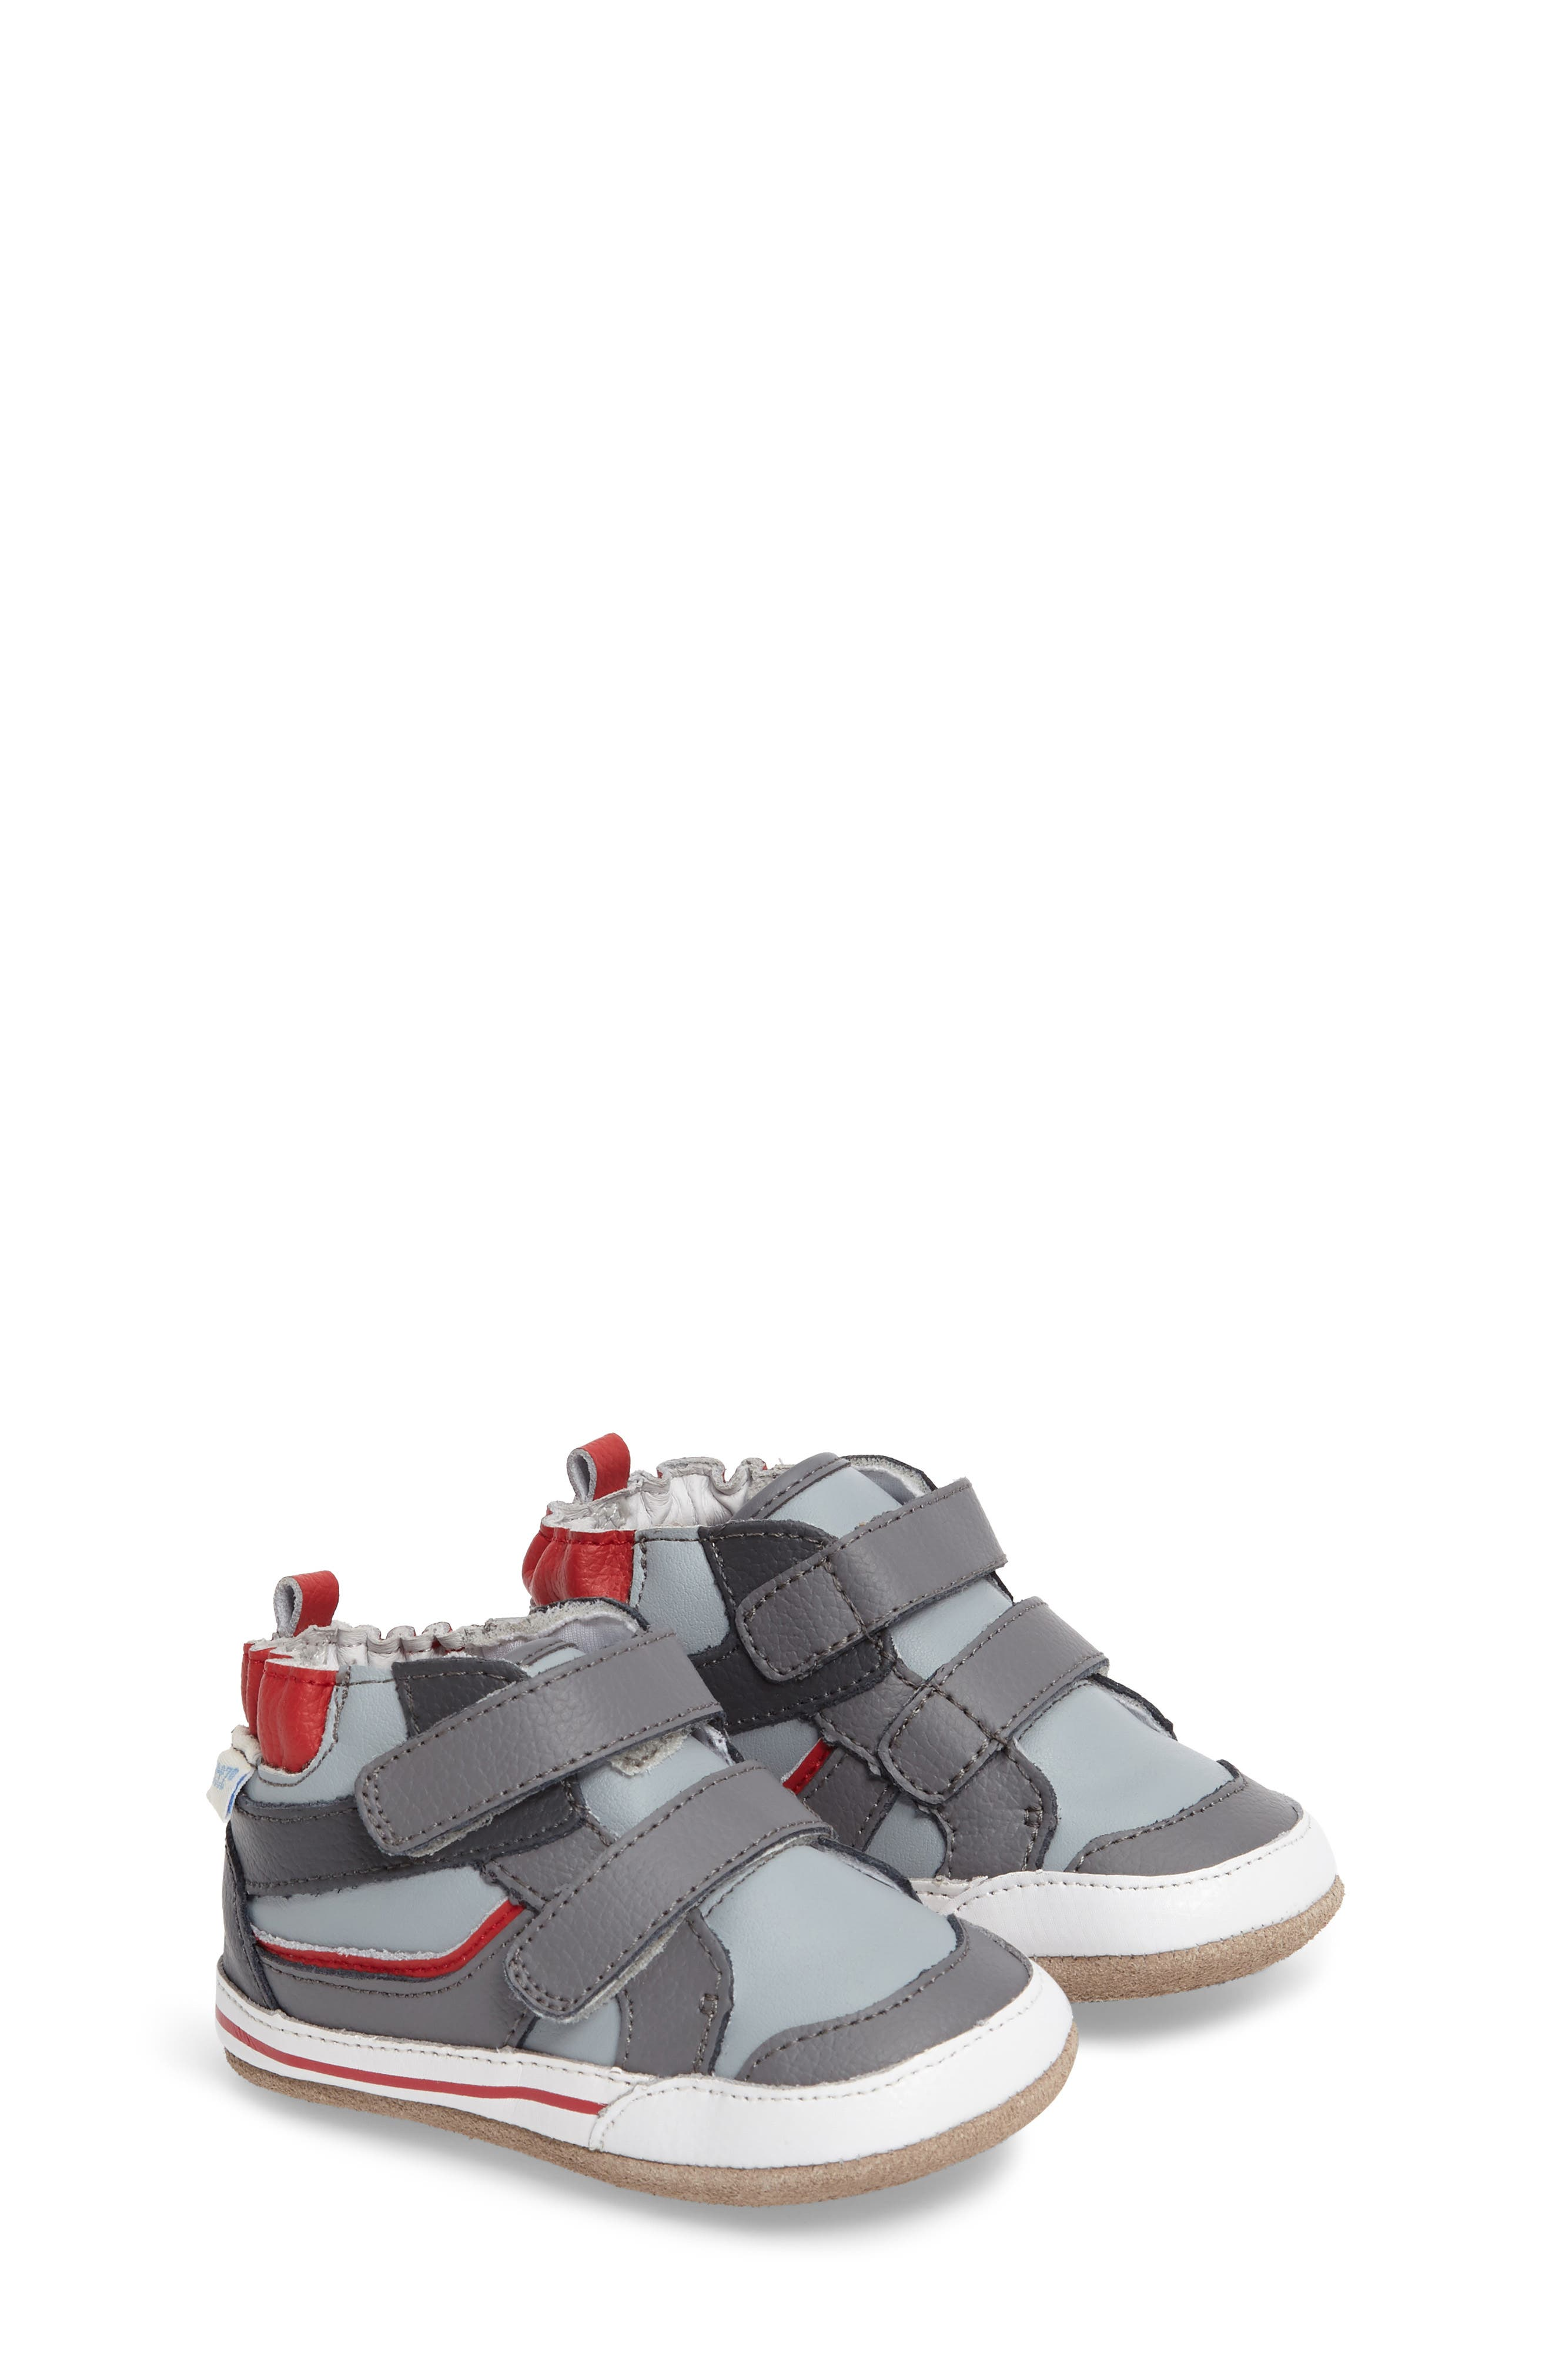 Robeez® Greg Crib Shoe (Baby & Walker)